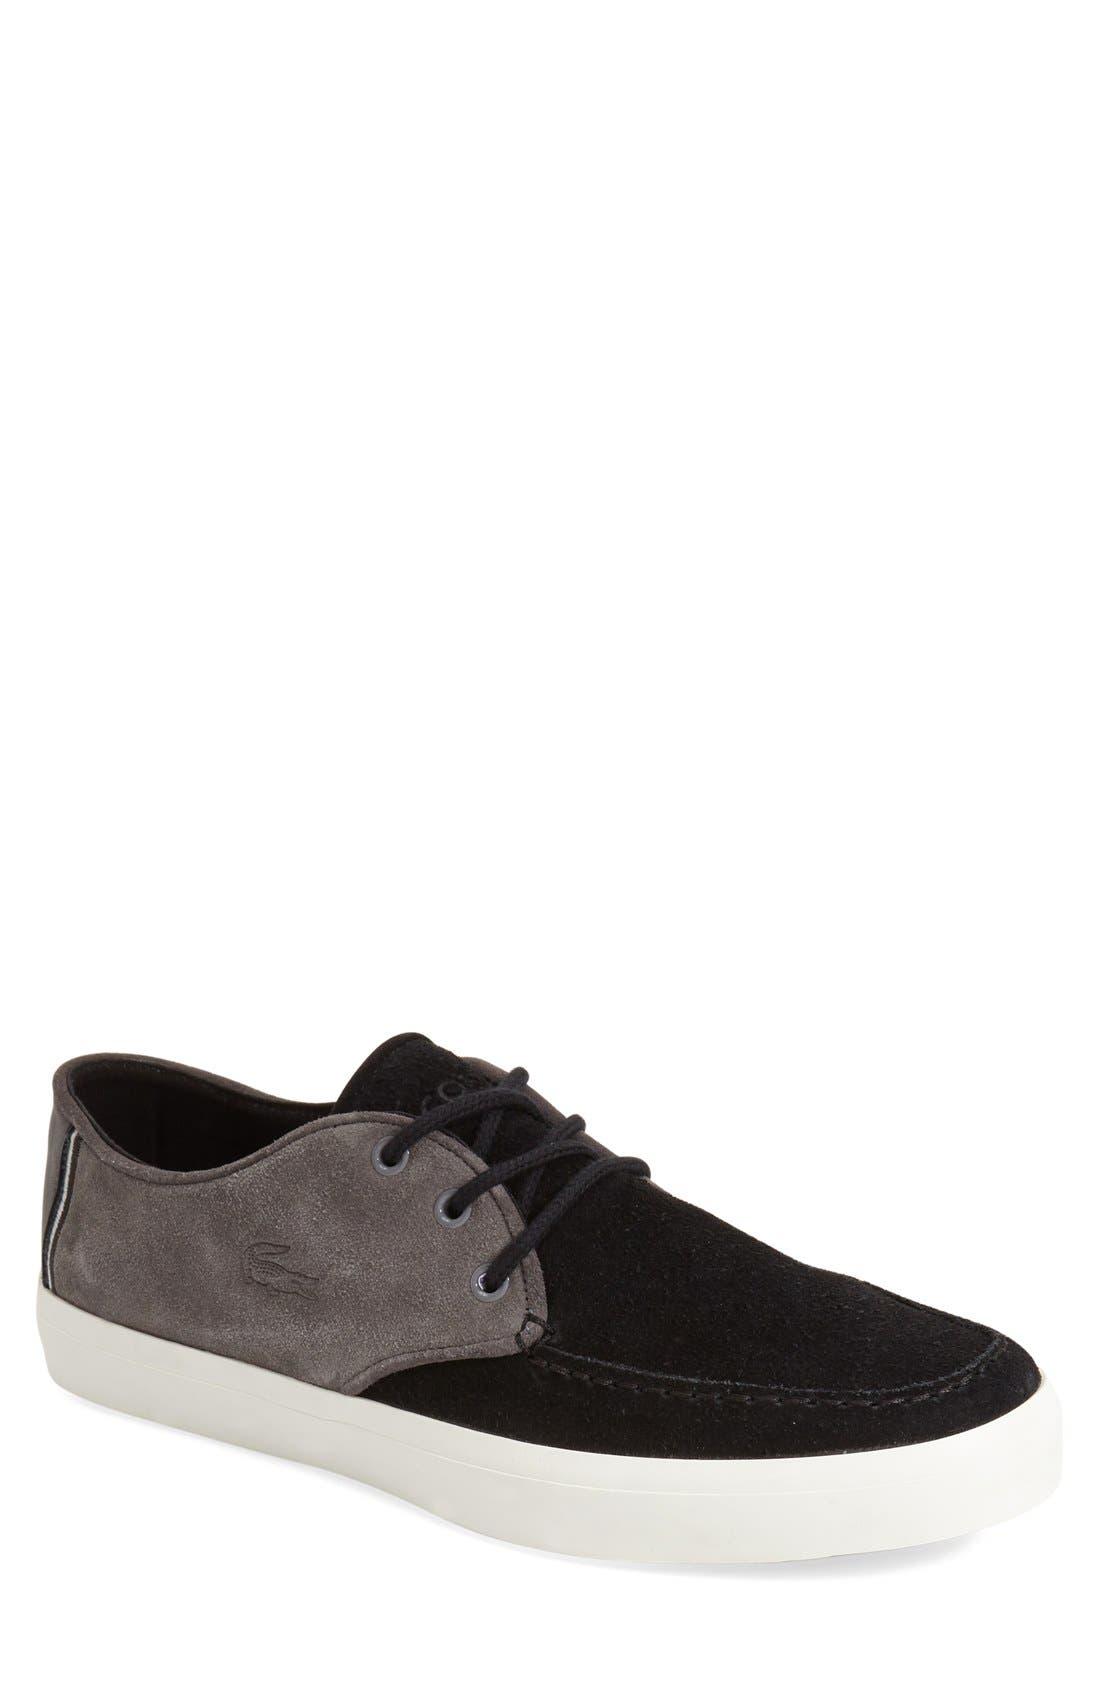 Alternate Image 1 Selected - Lacoste 'Sevrin 1161' Sneaker (Men)